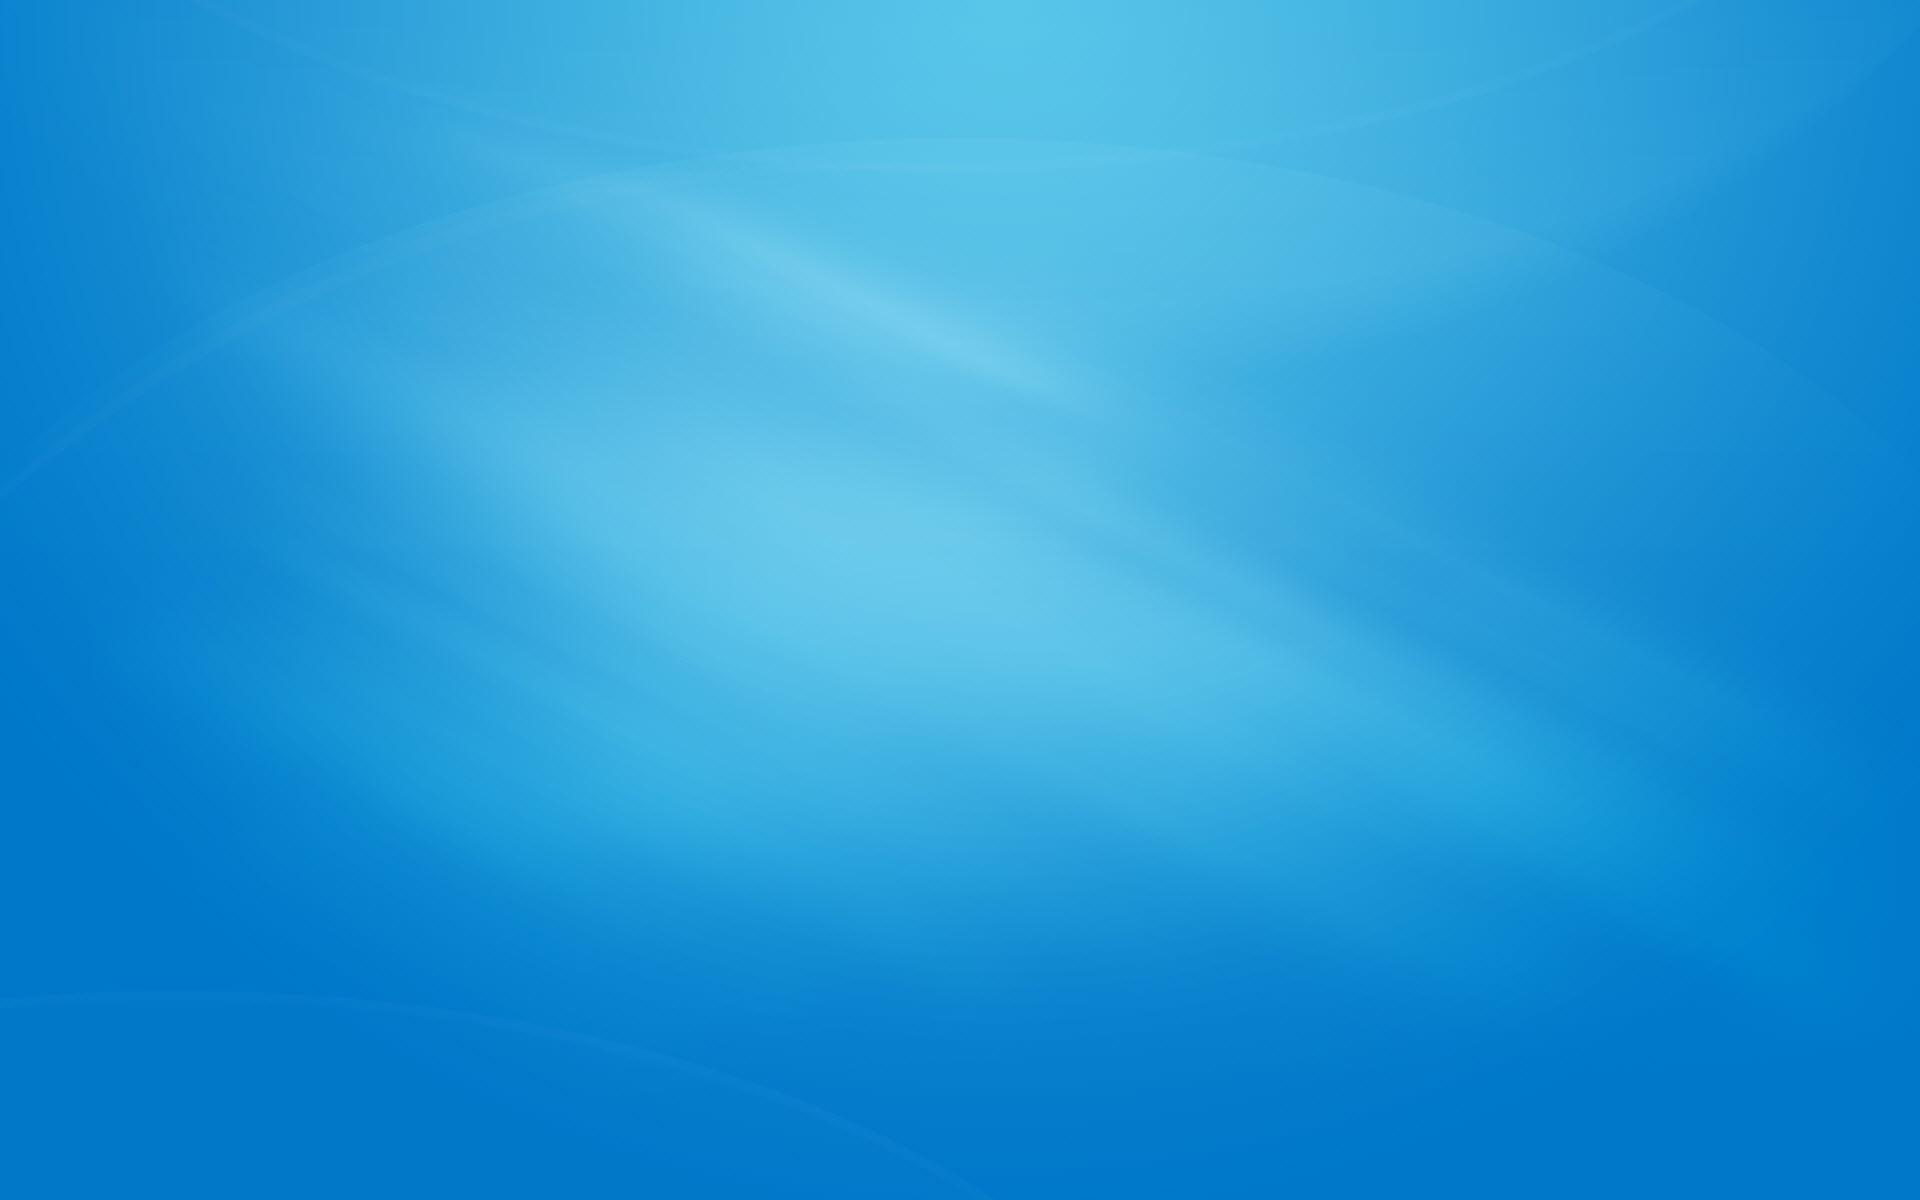 hinh nen mau xanh 1